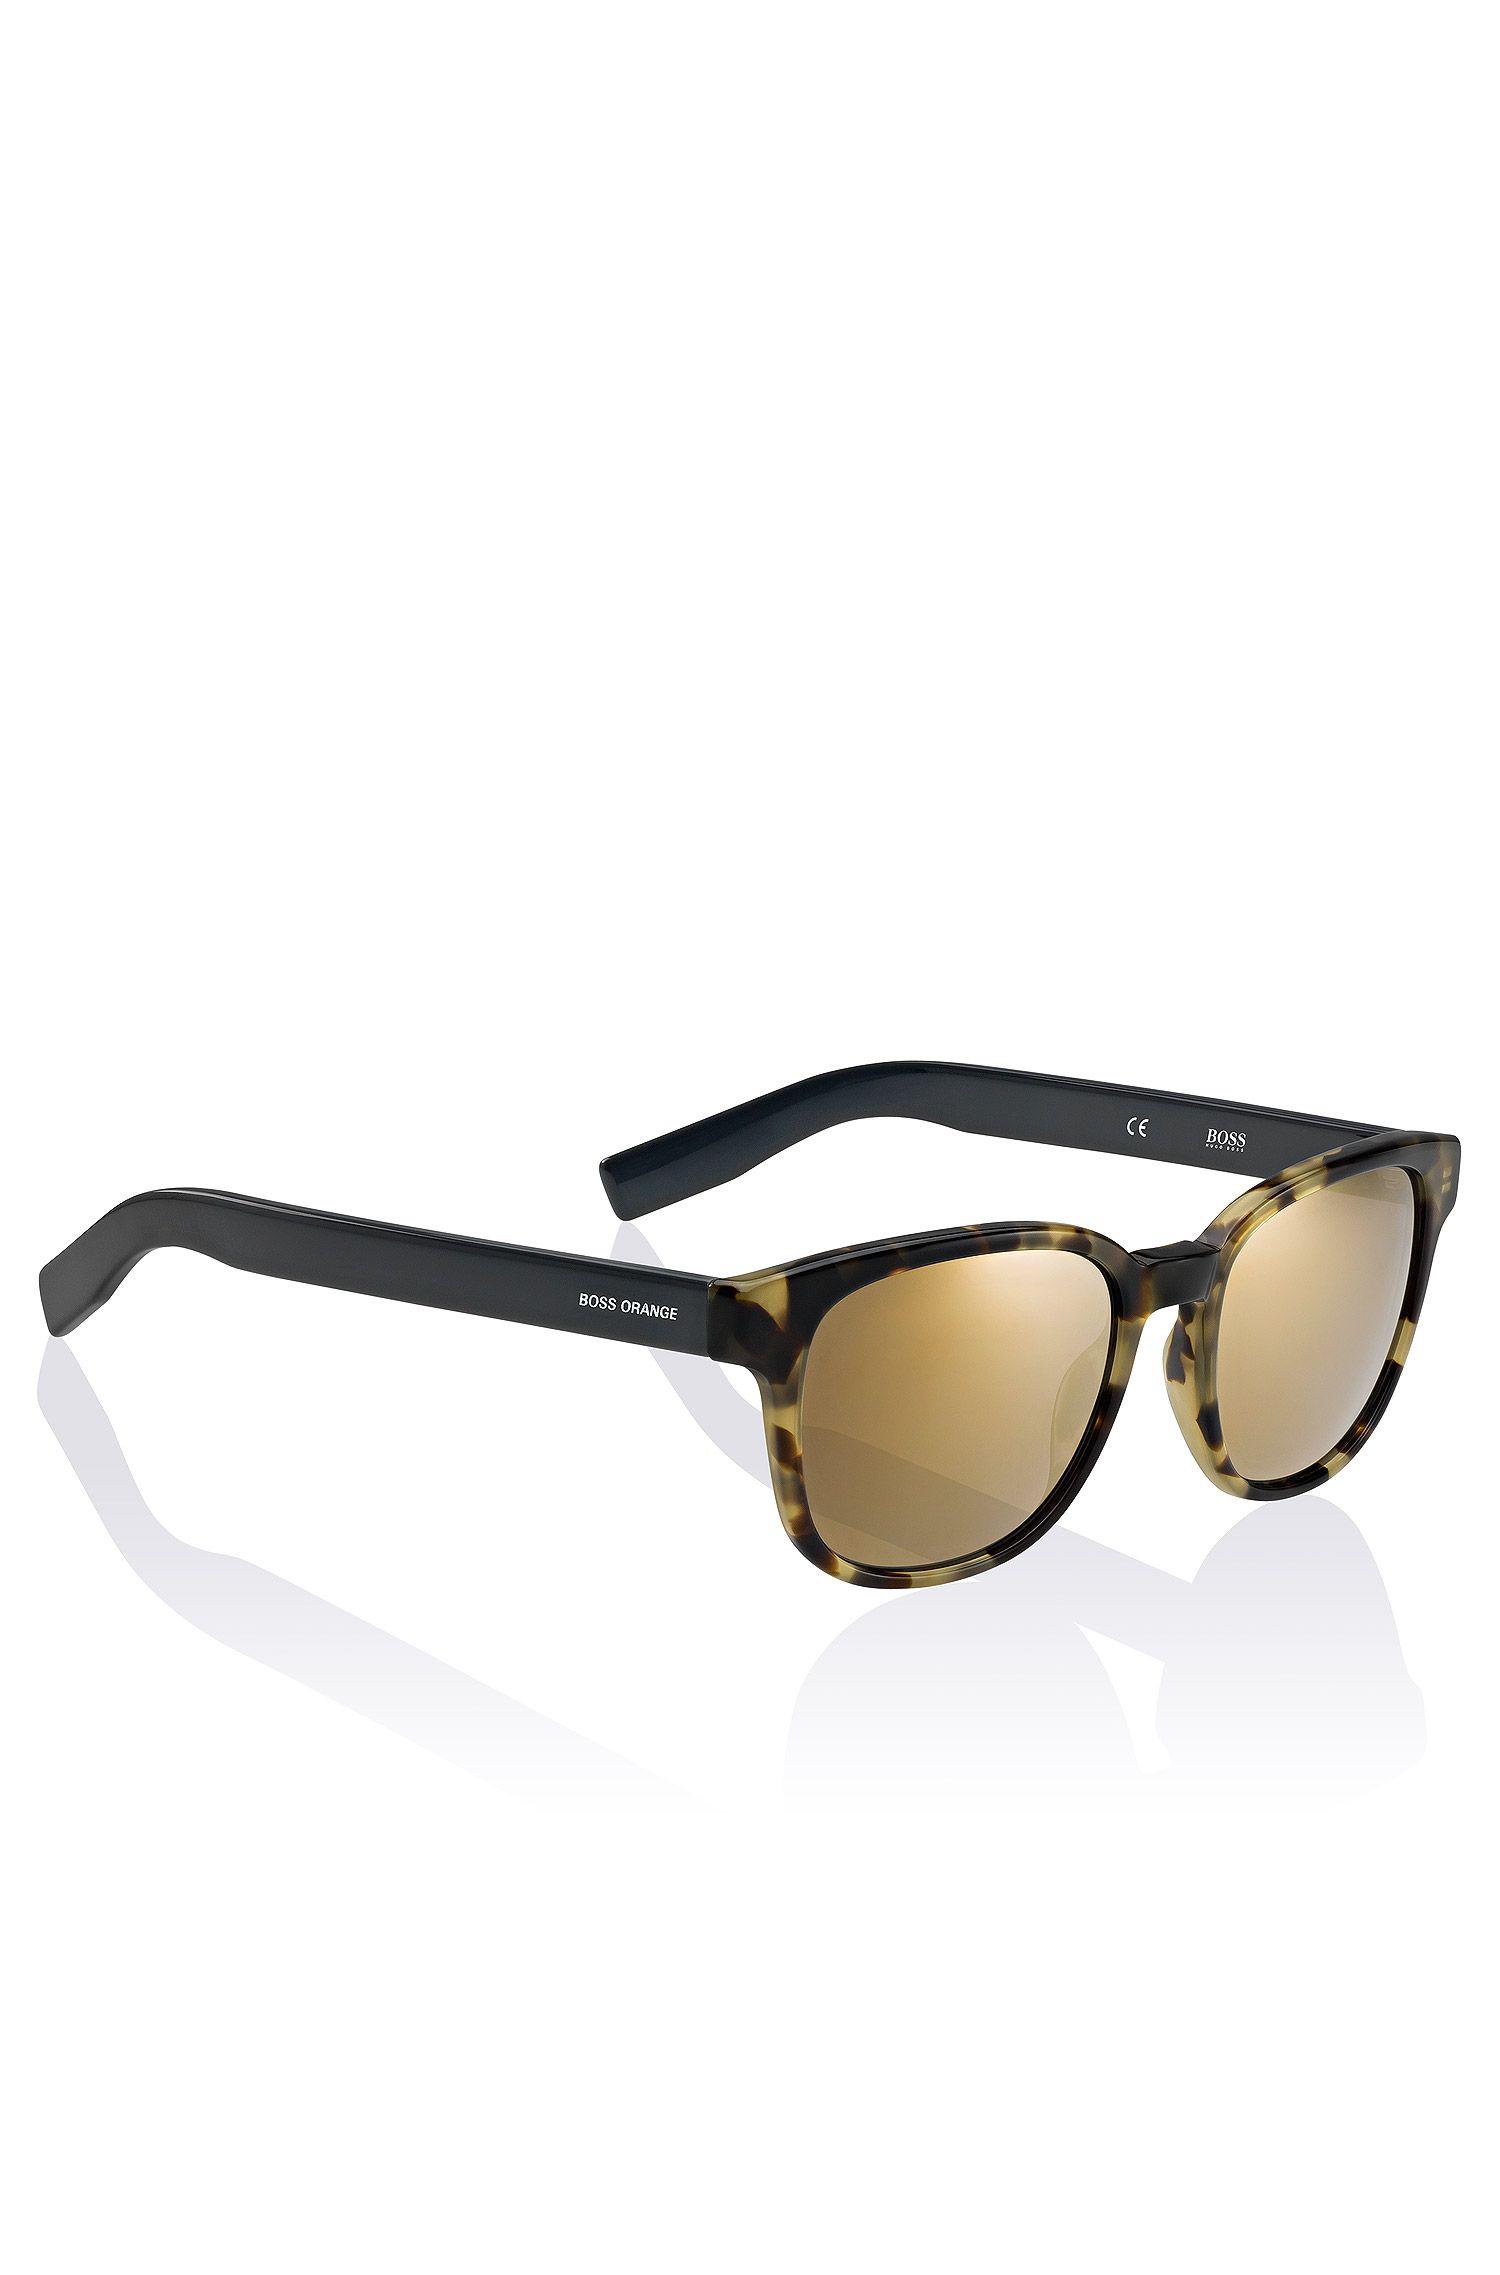 Wayfarer-Sonnenbrille ´BO 0193`